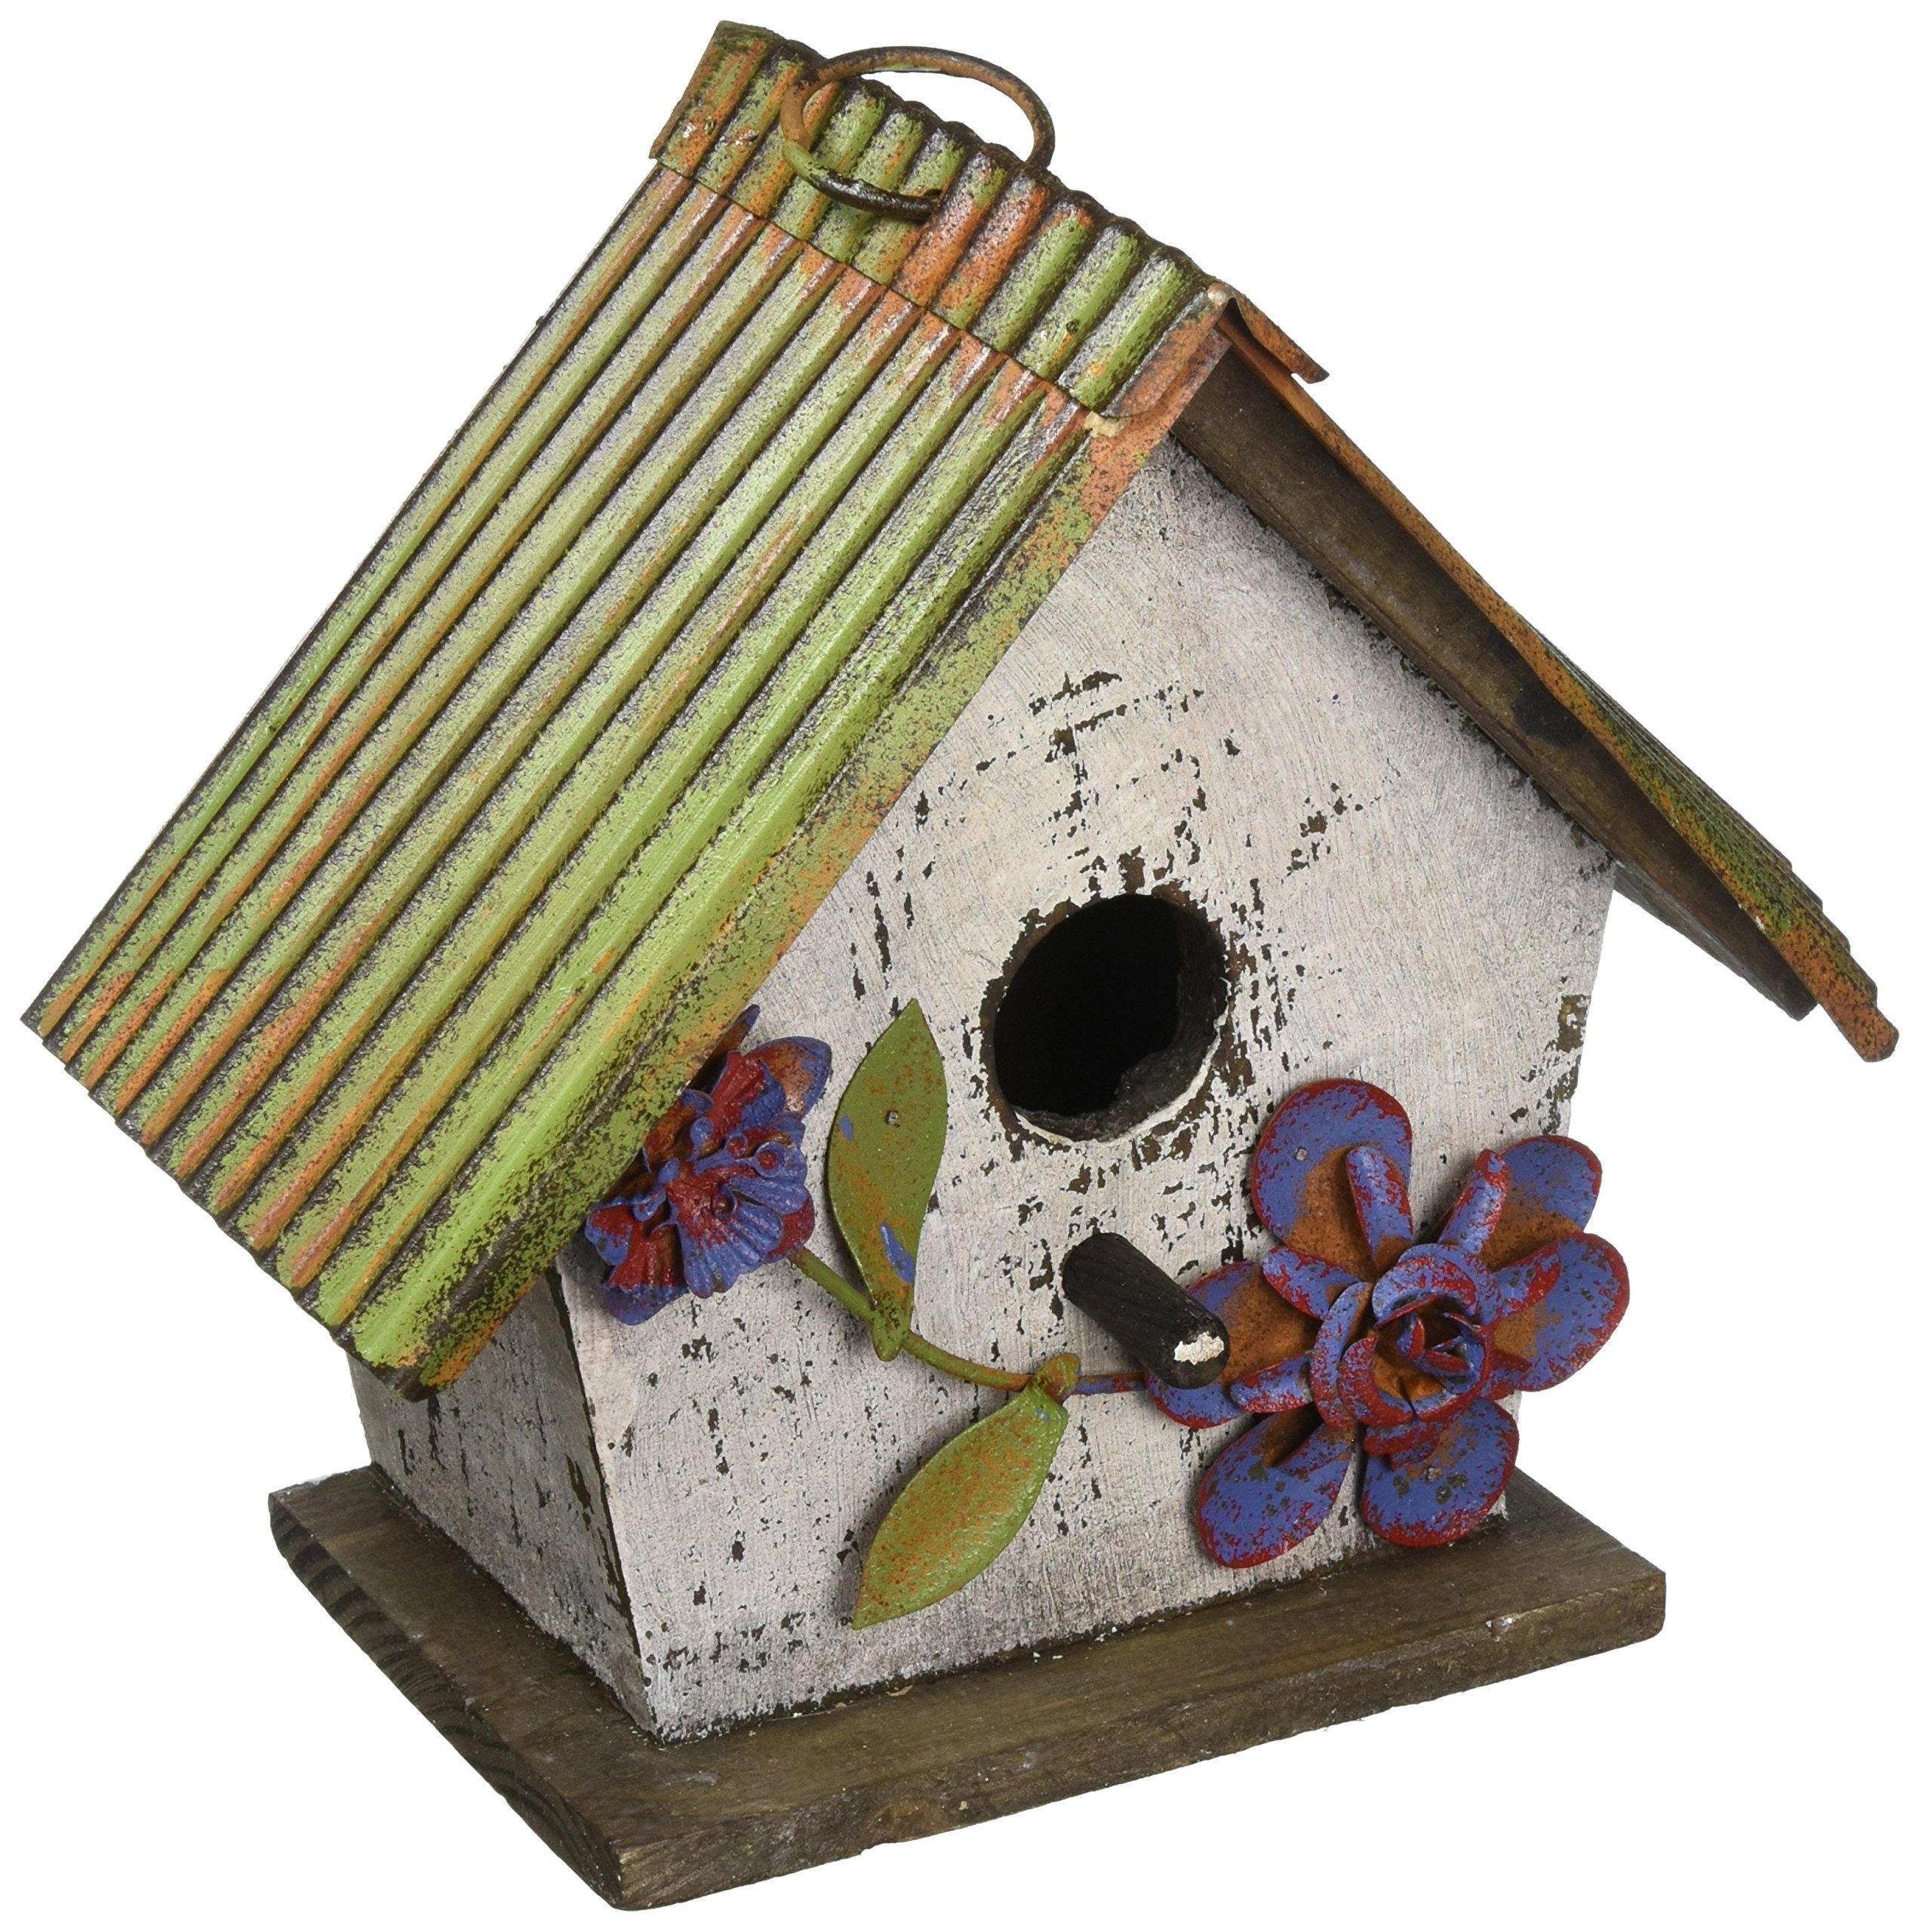 50 Decorative Indoor Bird Houses You Ll Love In 2020